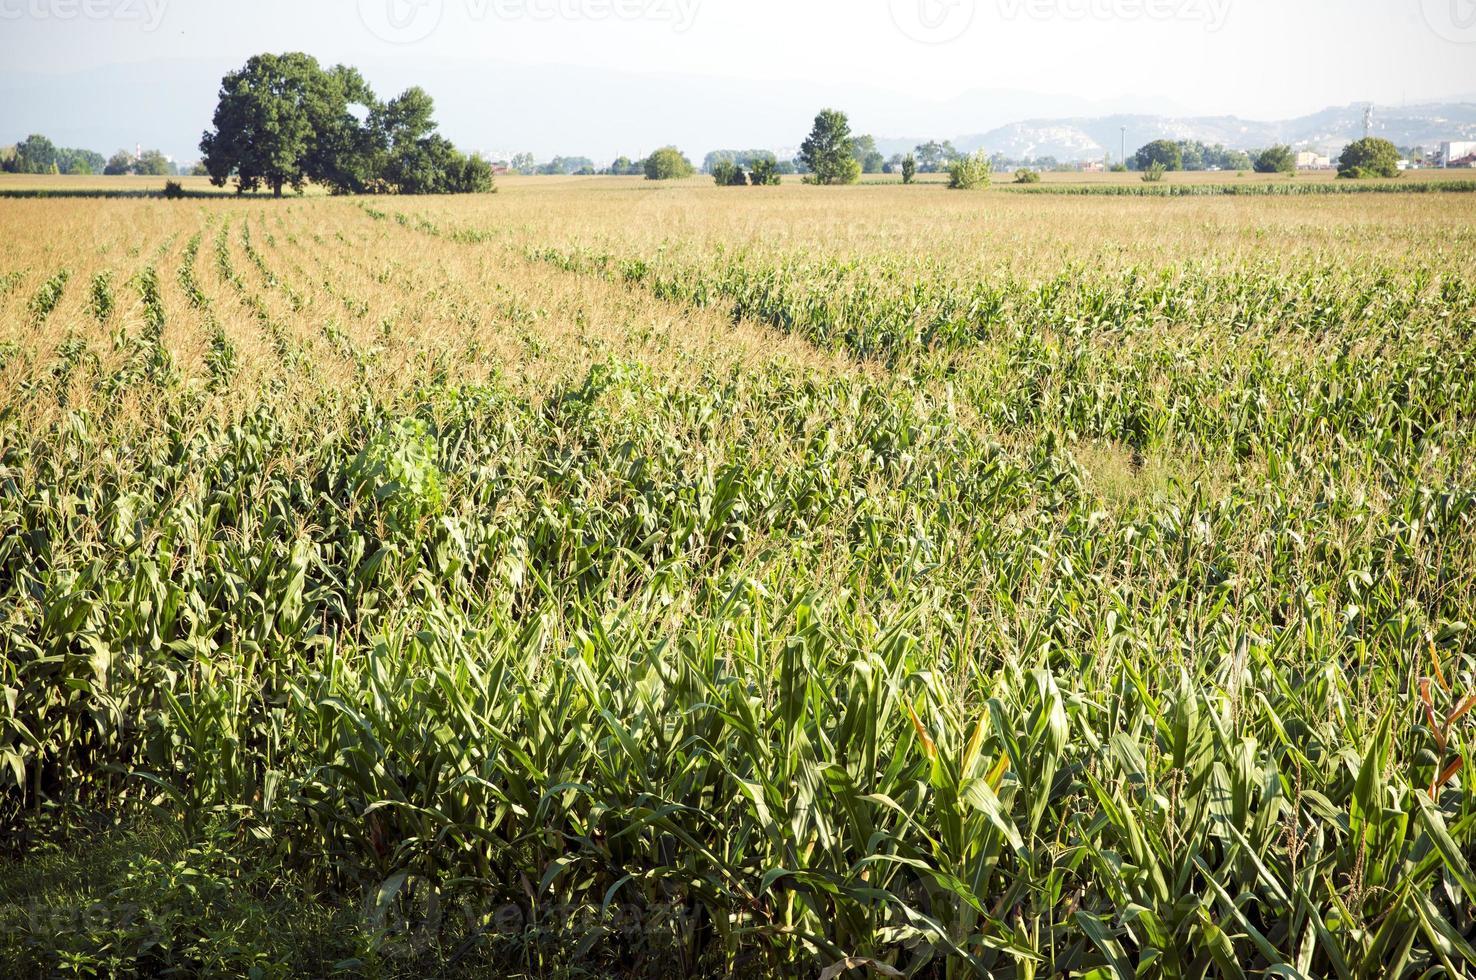 frischer Mais auf dem Feld foto